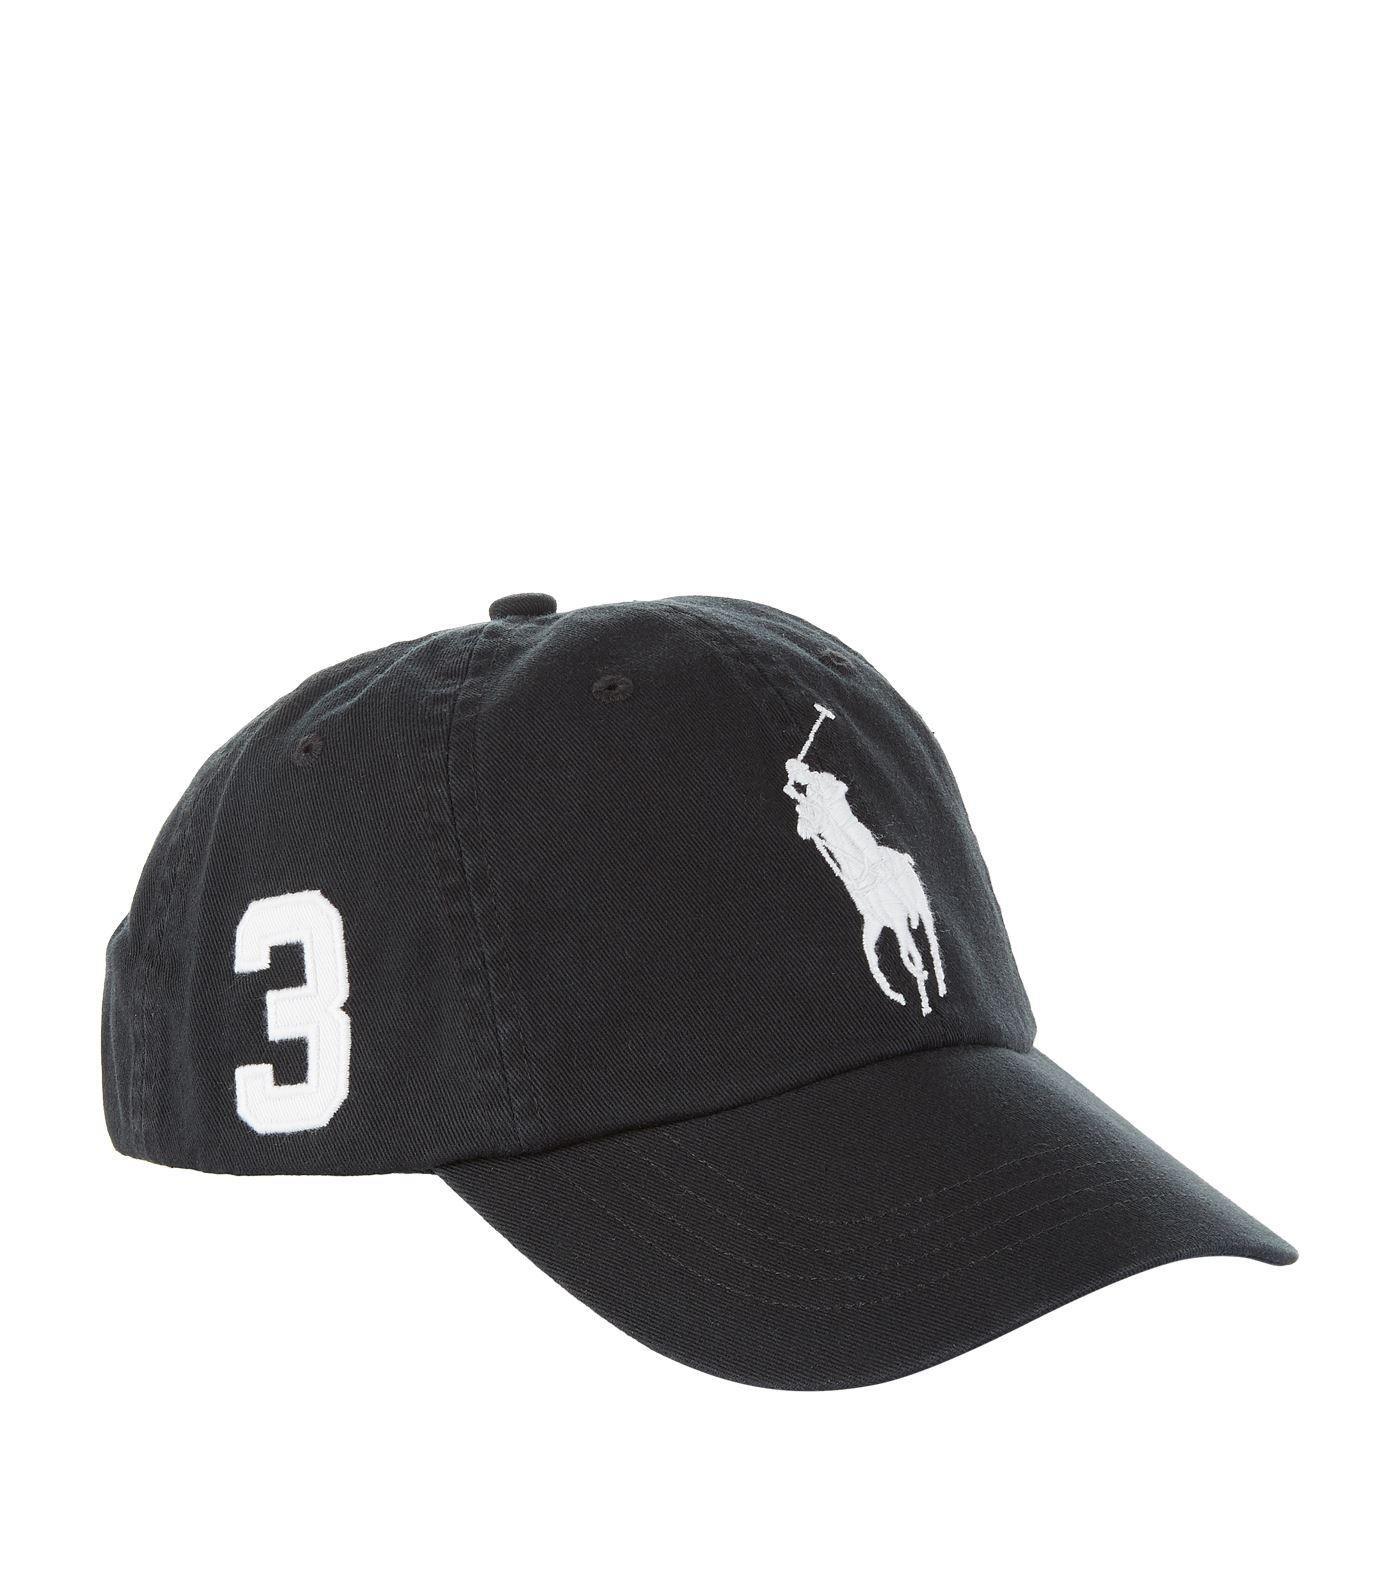 Lyst - Ralph Lauren Polo Pony Baseball Cap in Black for Men d6df39d5729